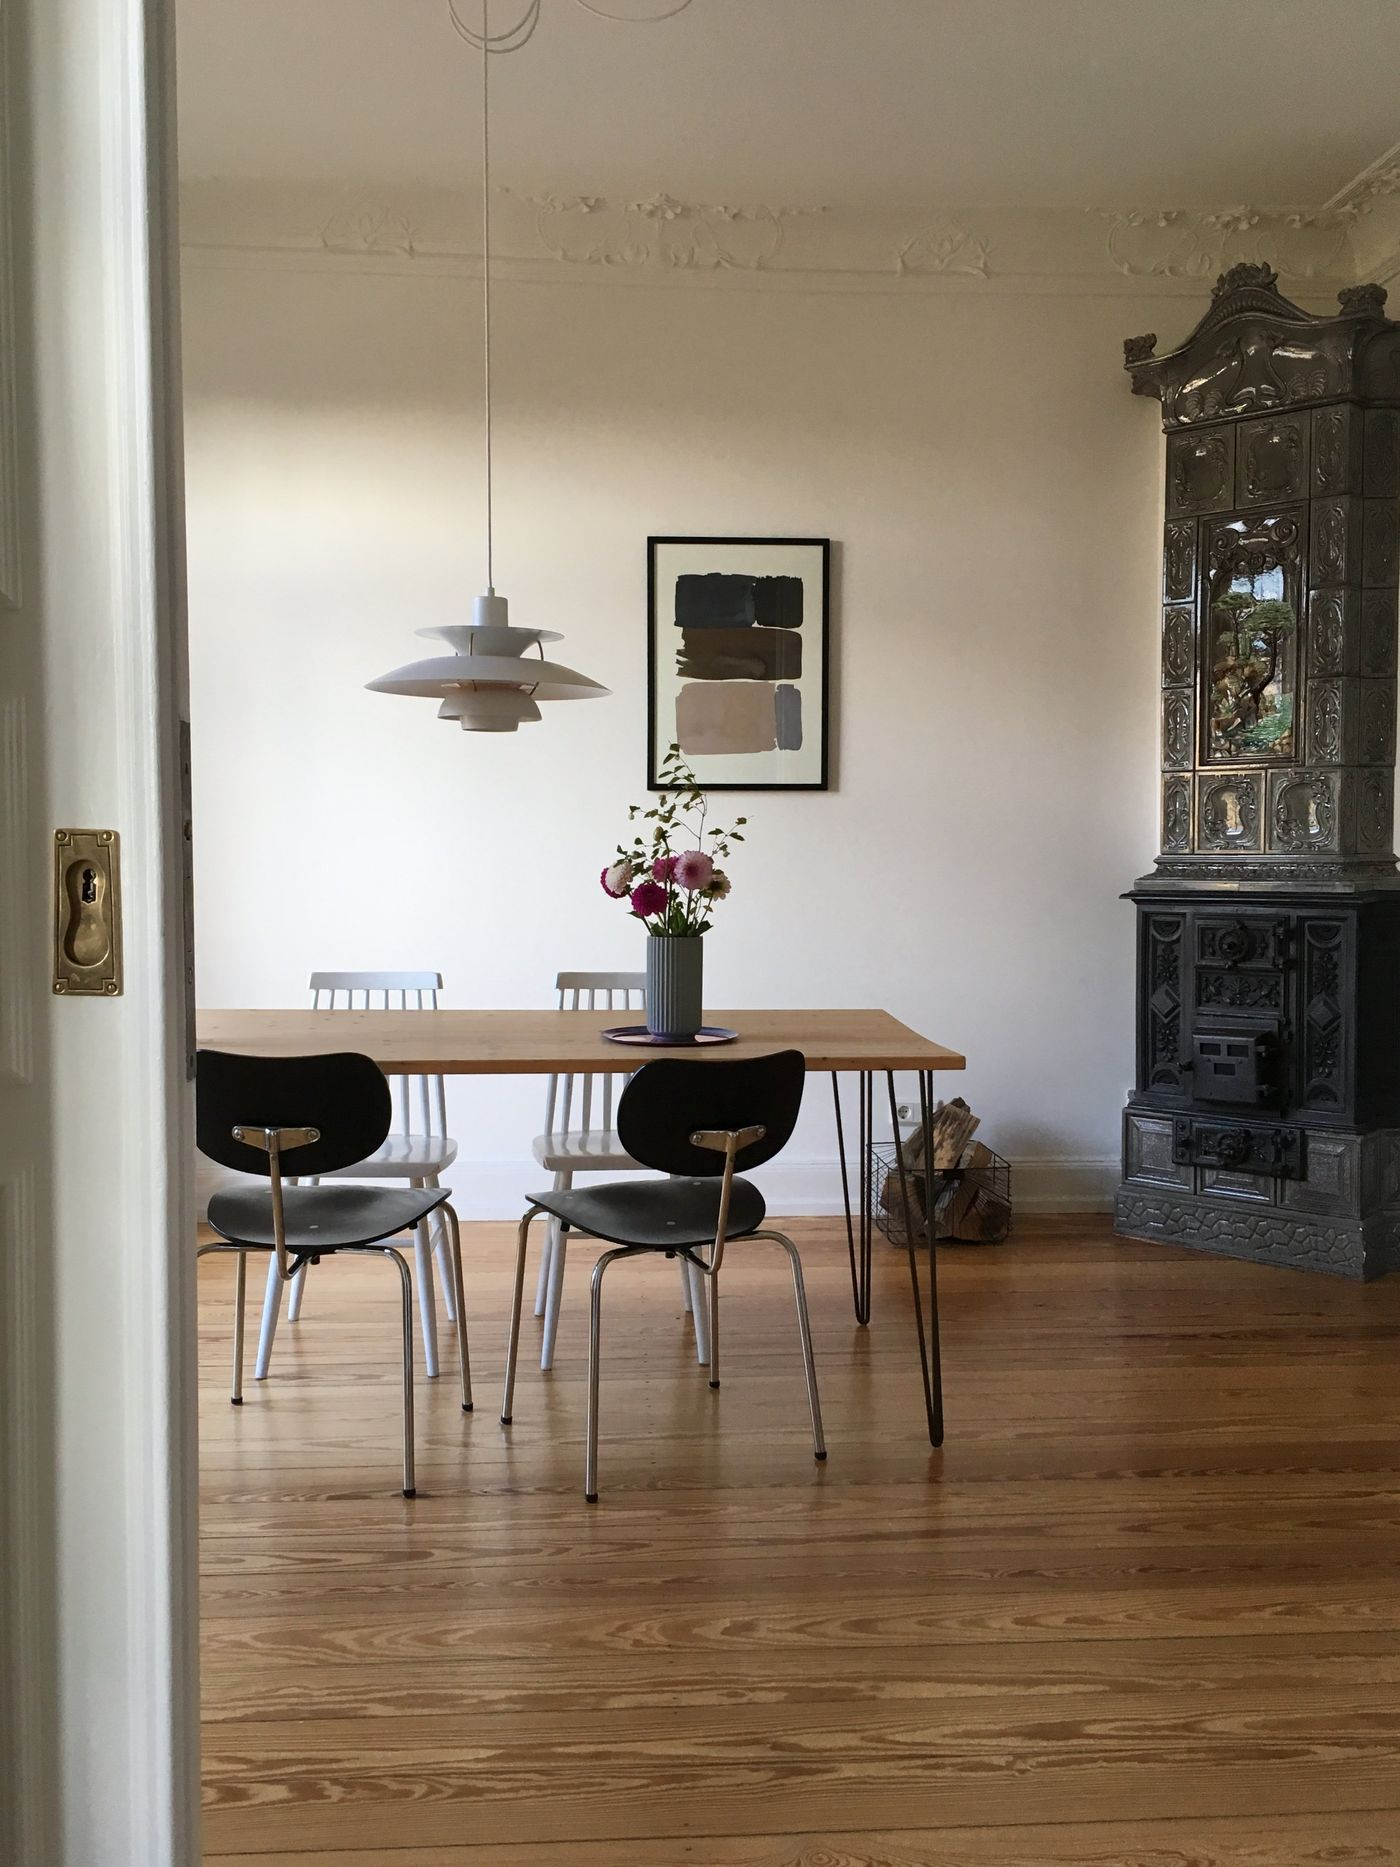 do it yourself ideen f r dein zuhause seite 35. Black Bedroom Furniture Sets. Home Design Ideas